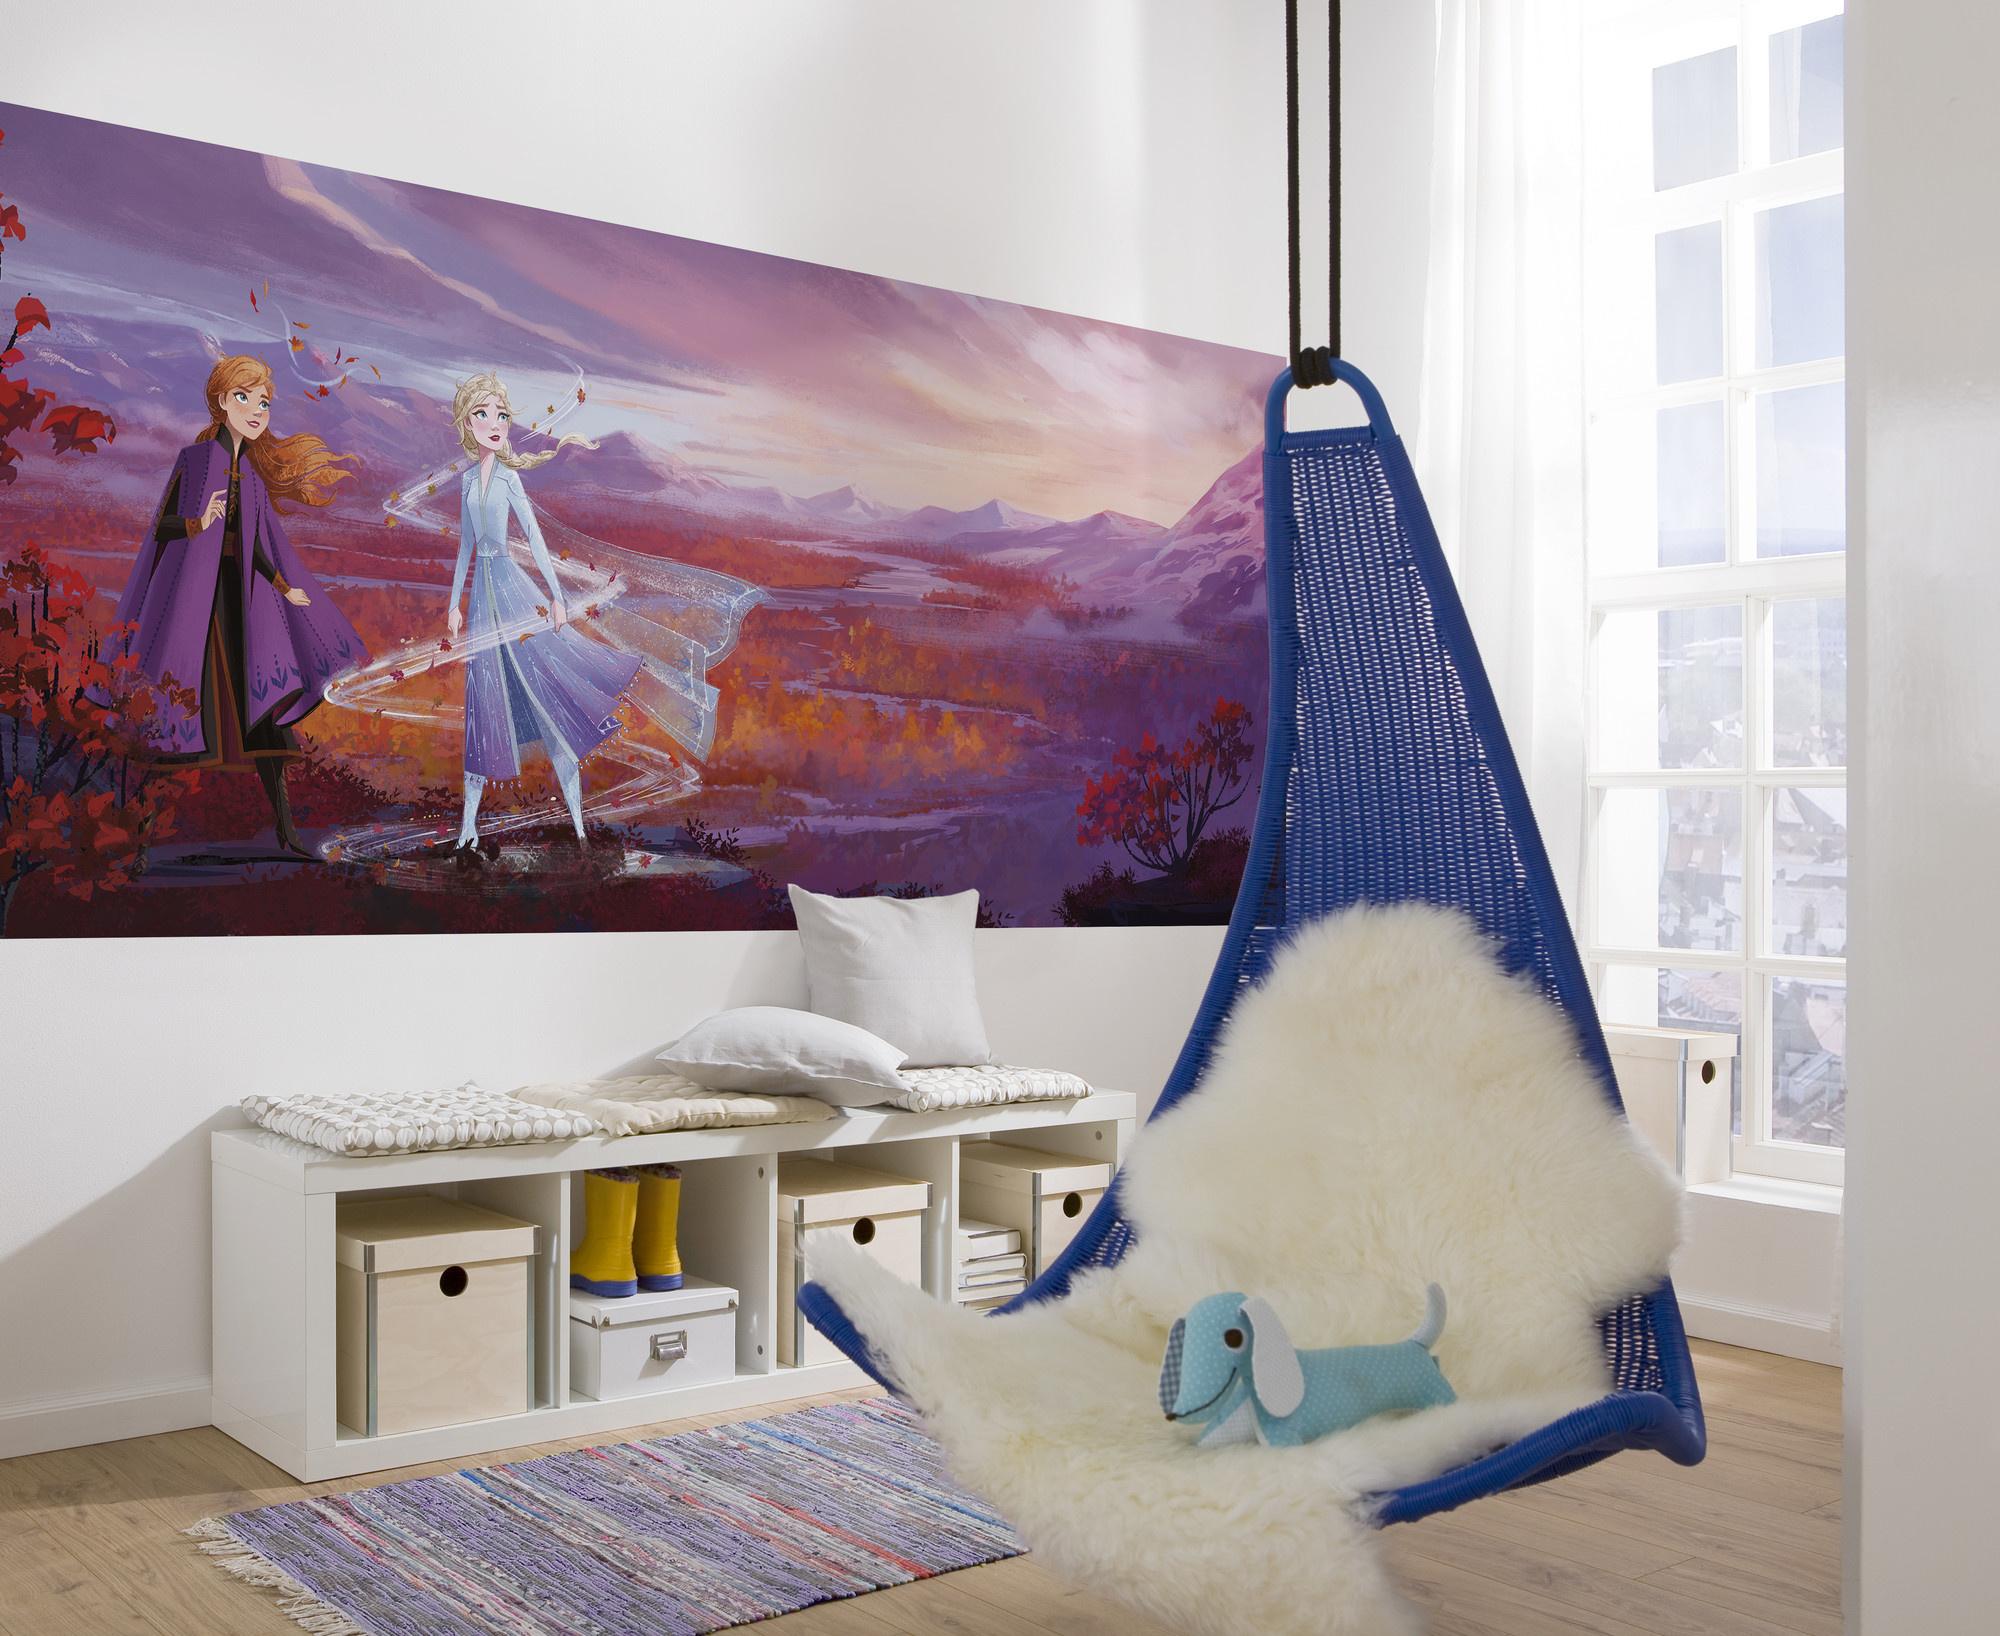 Disney Edition 4 Kinderbehang Komar - Kinderkamer behang FROZEN PANAROMA